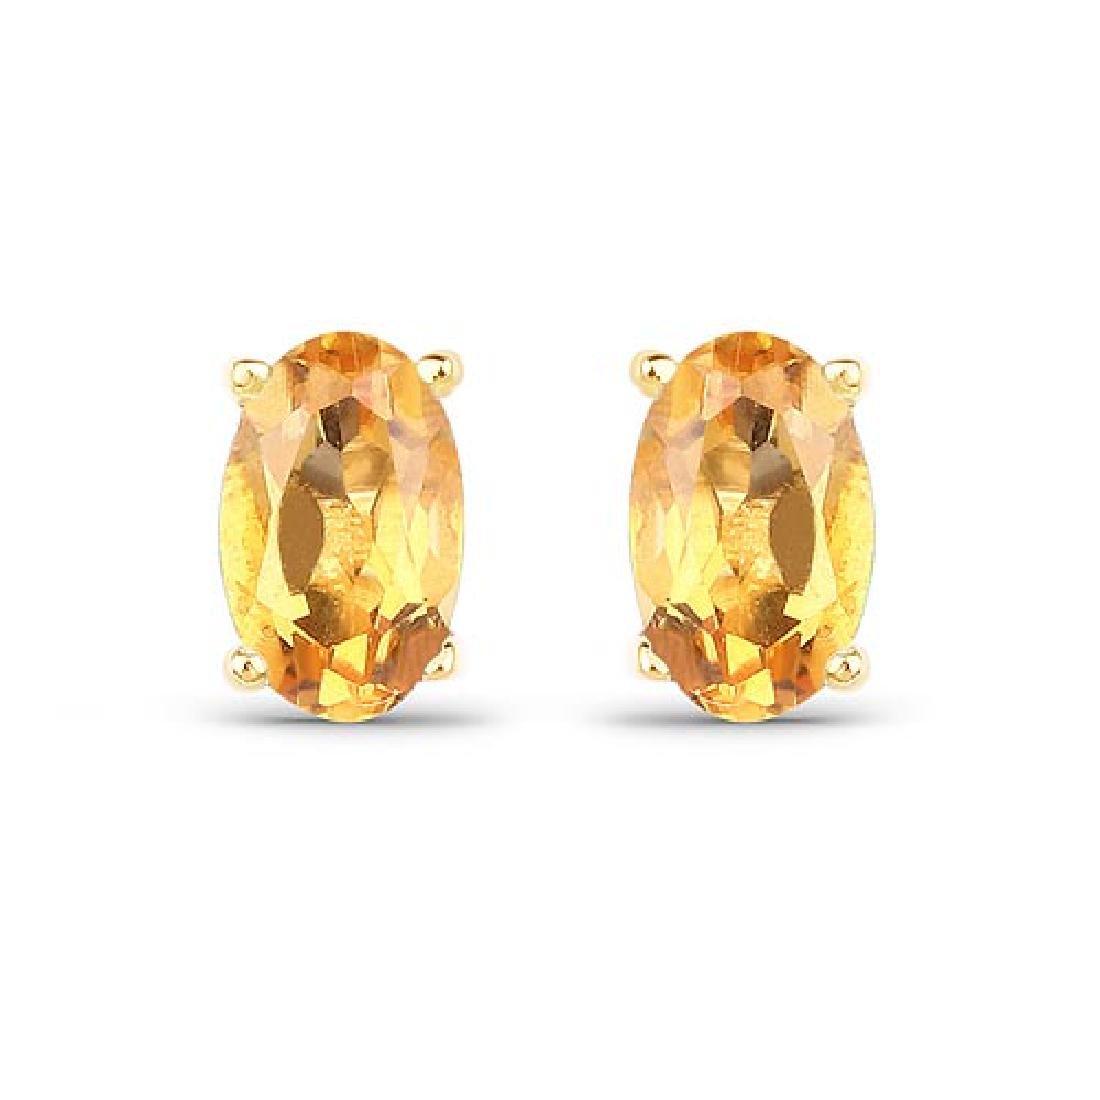 0.44 Carat Genuine Citrine 10K Yellow Gold Earrings